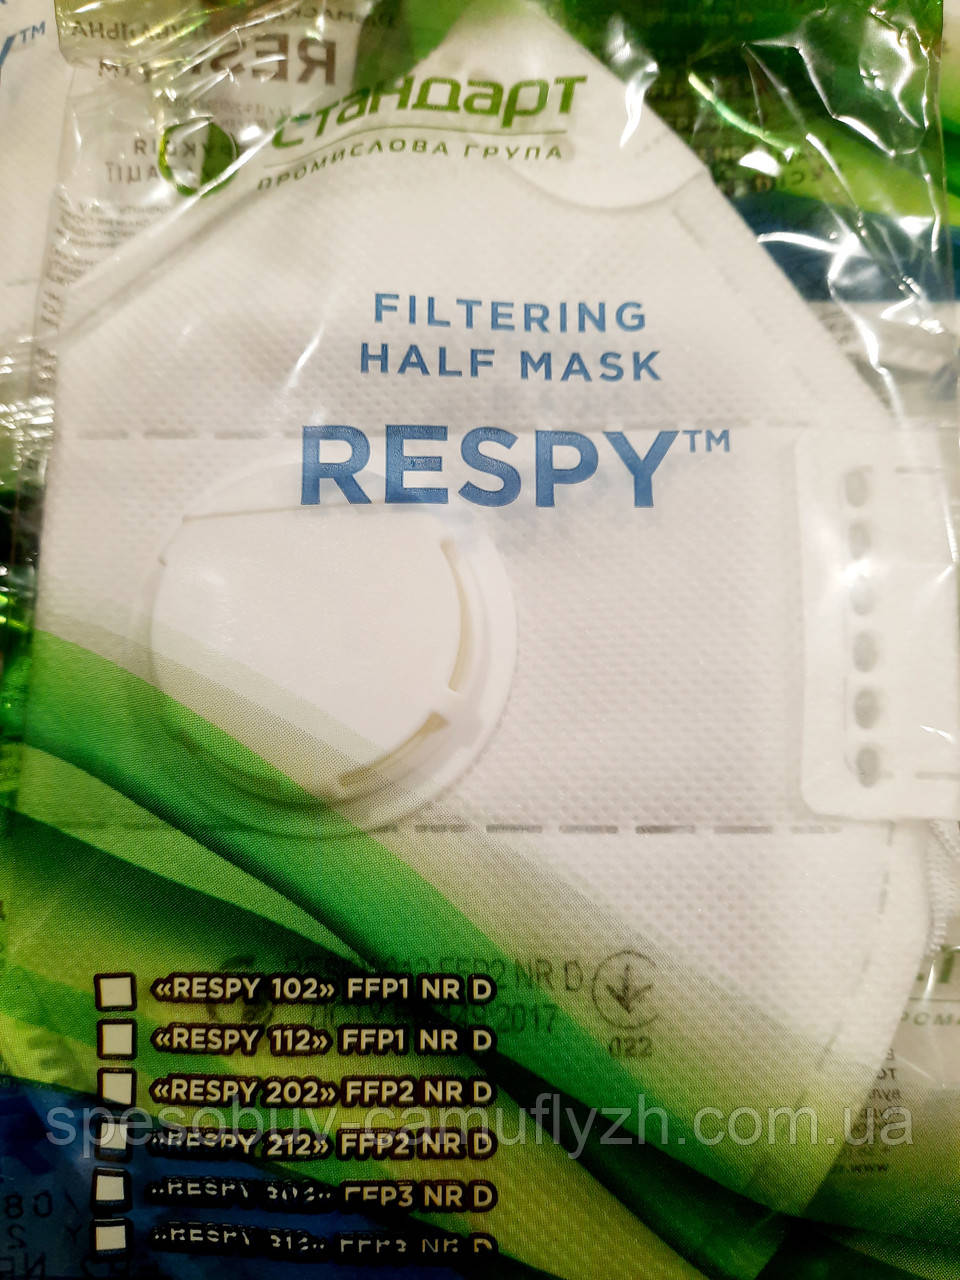 СТАНДАРТ Respy 212 FFP2 захисна маска, Респіратор